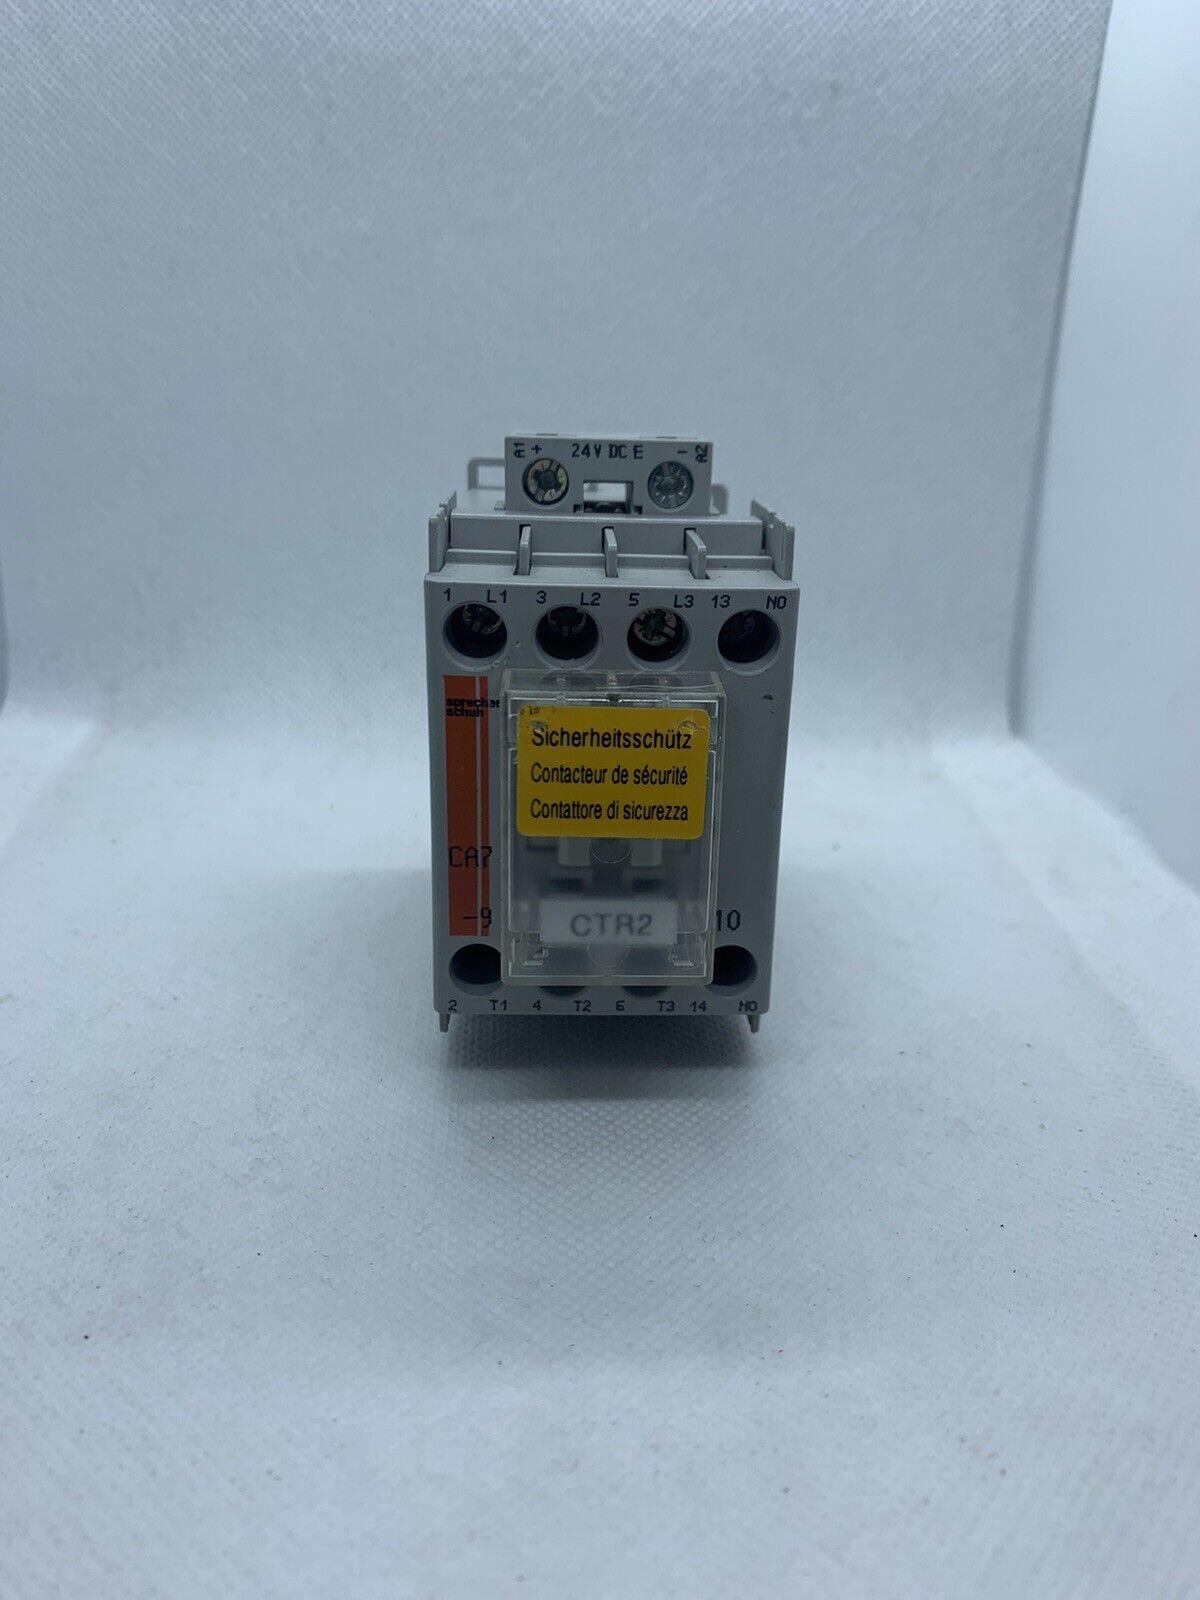 Details about  /Sprecher+Schuh CA7-9E-10-24E Non-Reversing Three Pole Contactor 24VDC